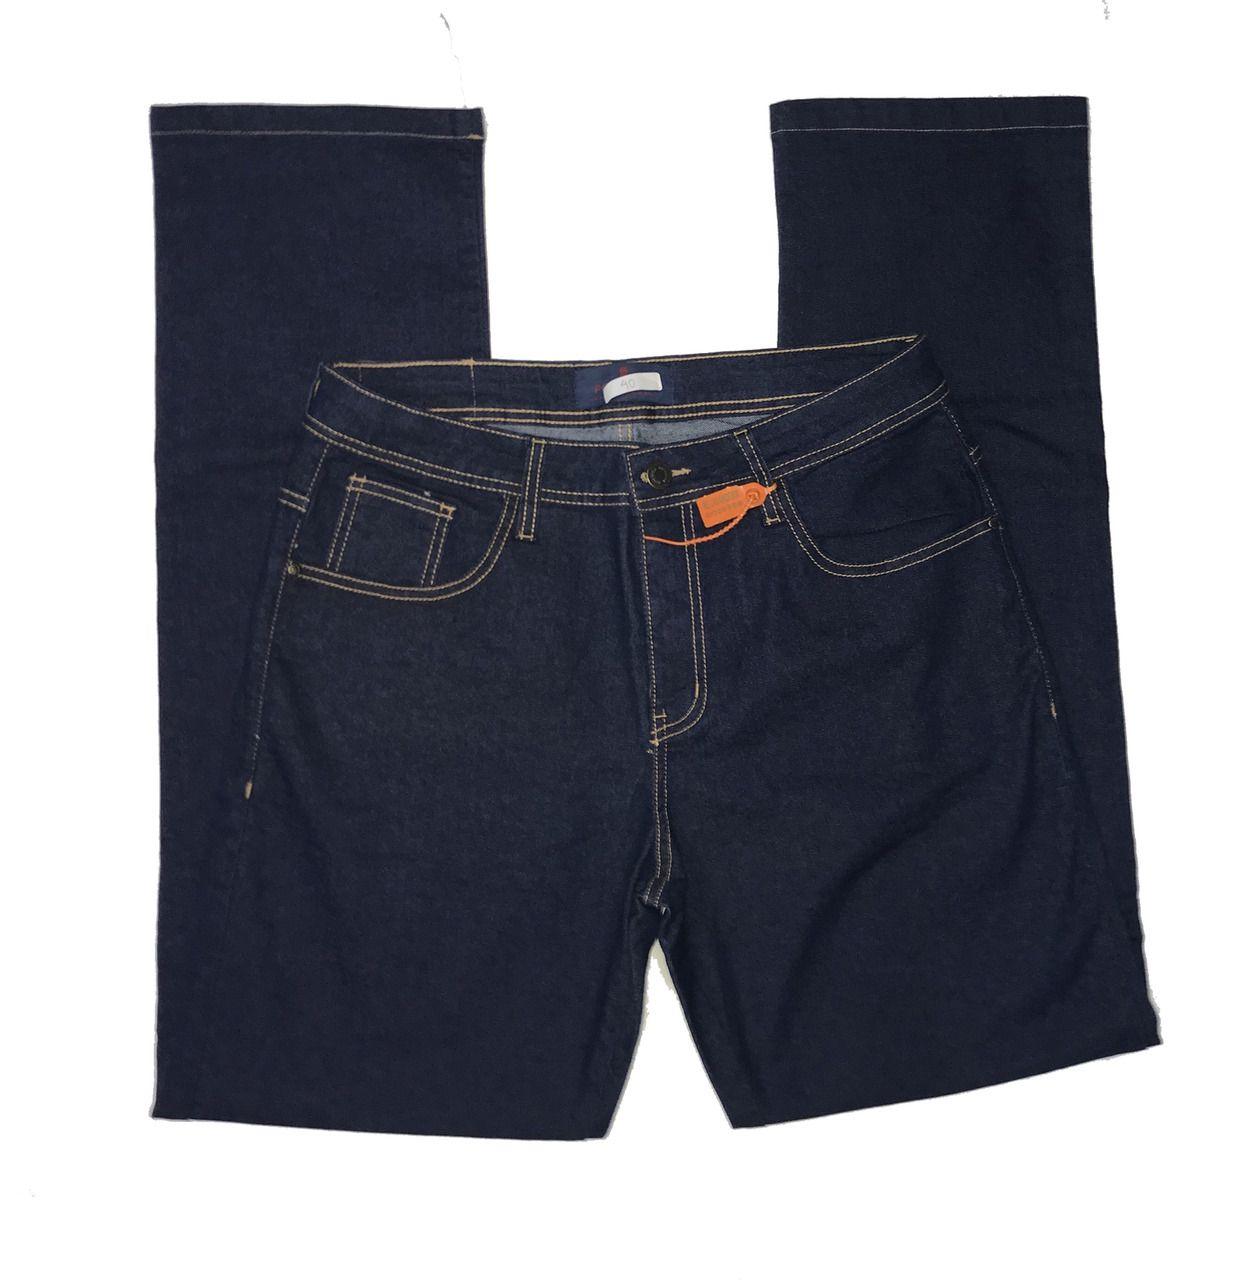 Calça Jeans Masculina Escura  - Loja Mangalarga